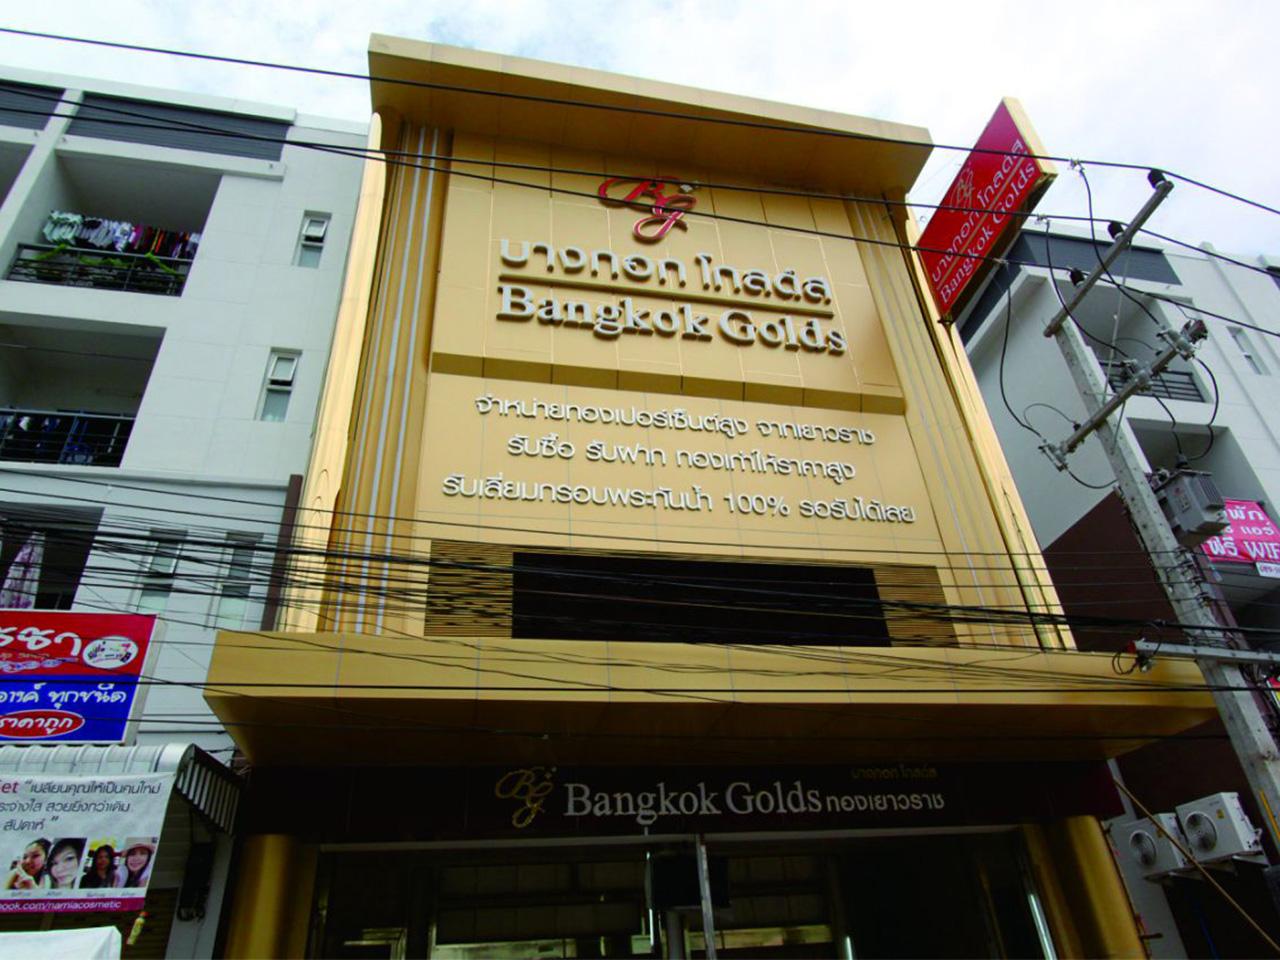 Gold shop Sign,ป้ายห้างทอง